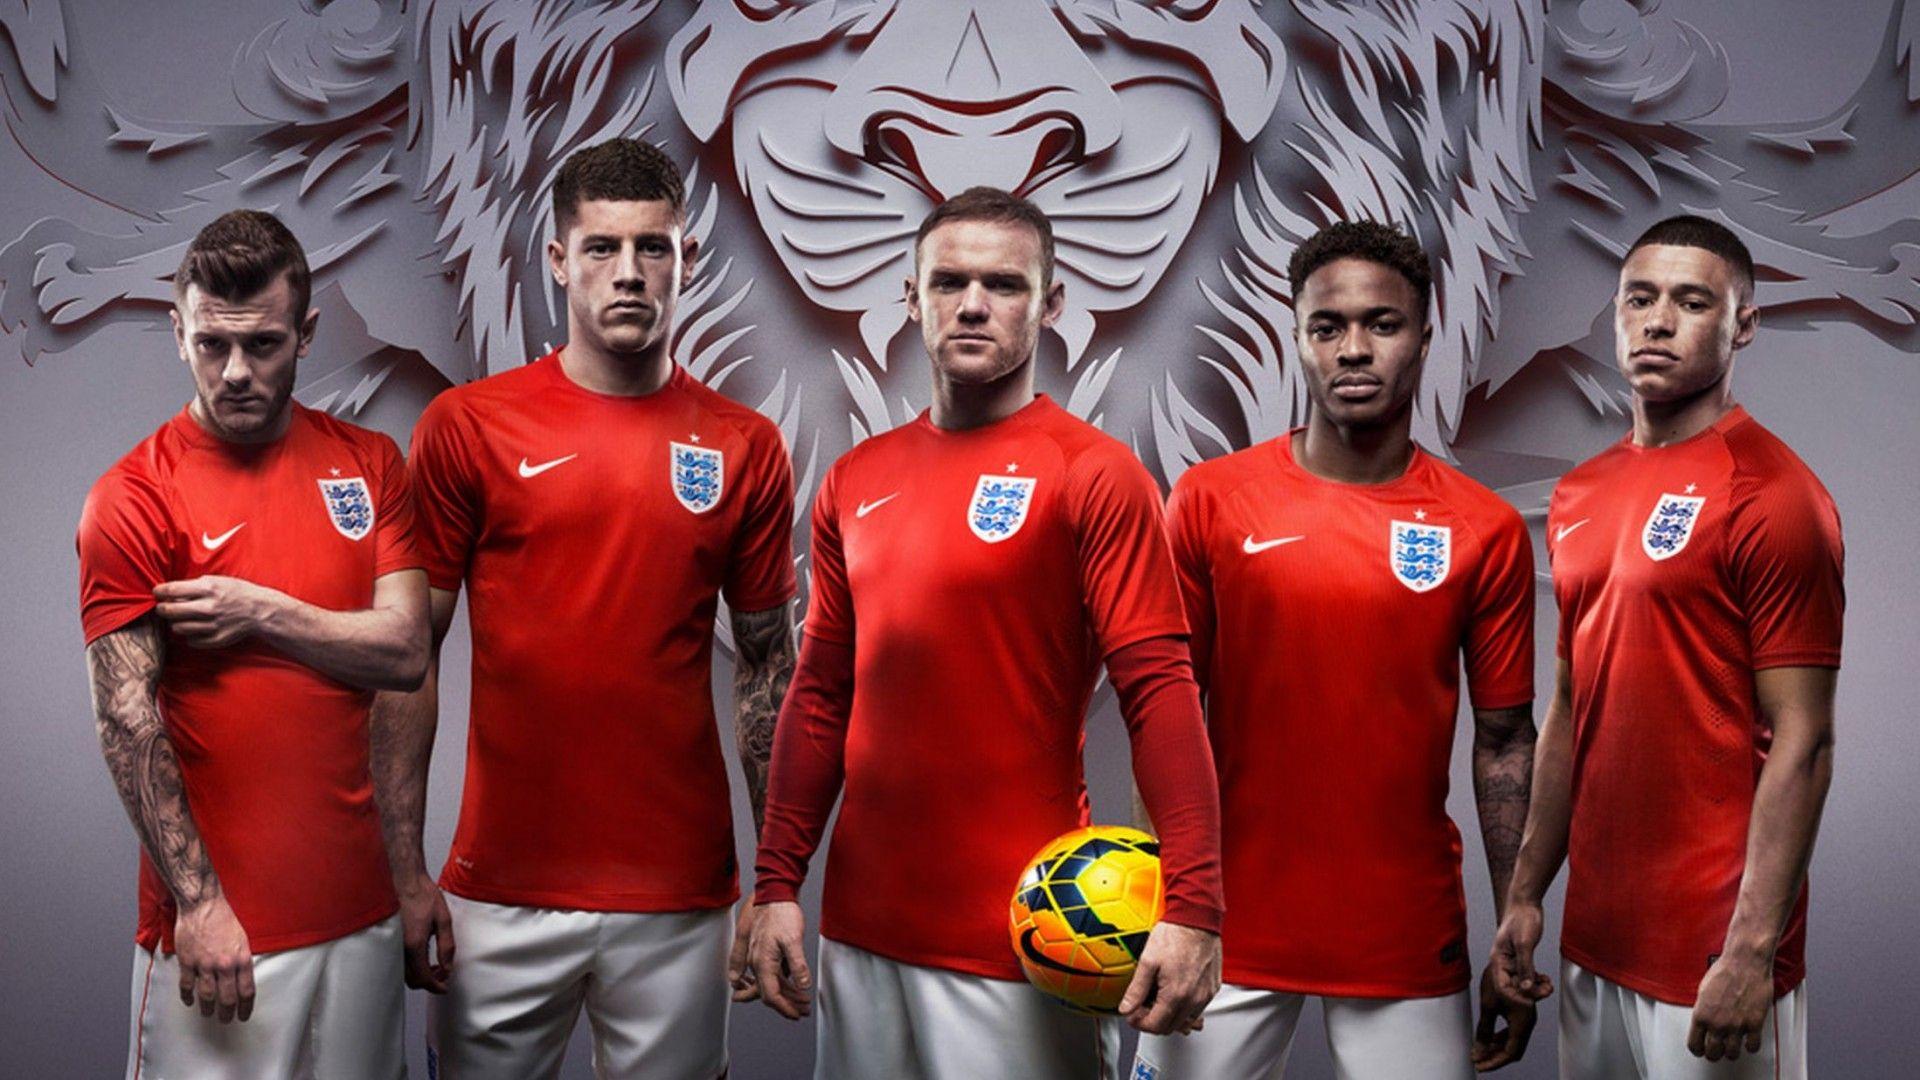 England World Cup 2014 Wallpaper England Football Kit England Football Team World Cup Shirts